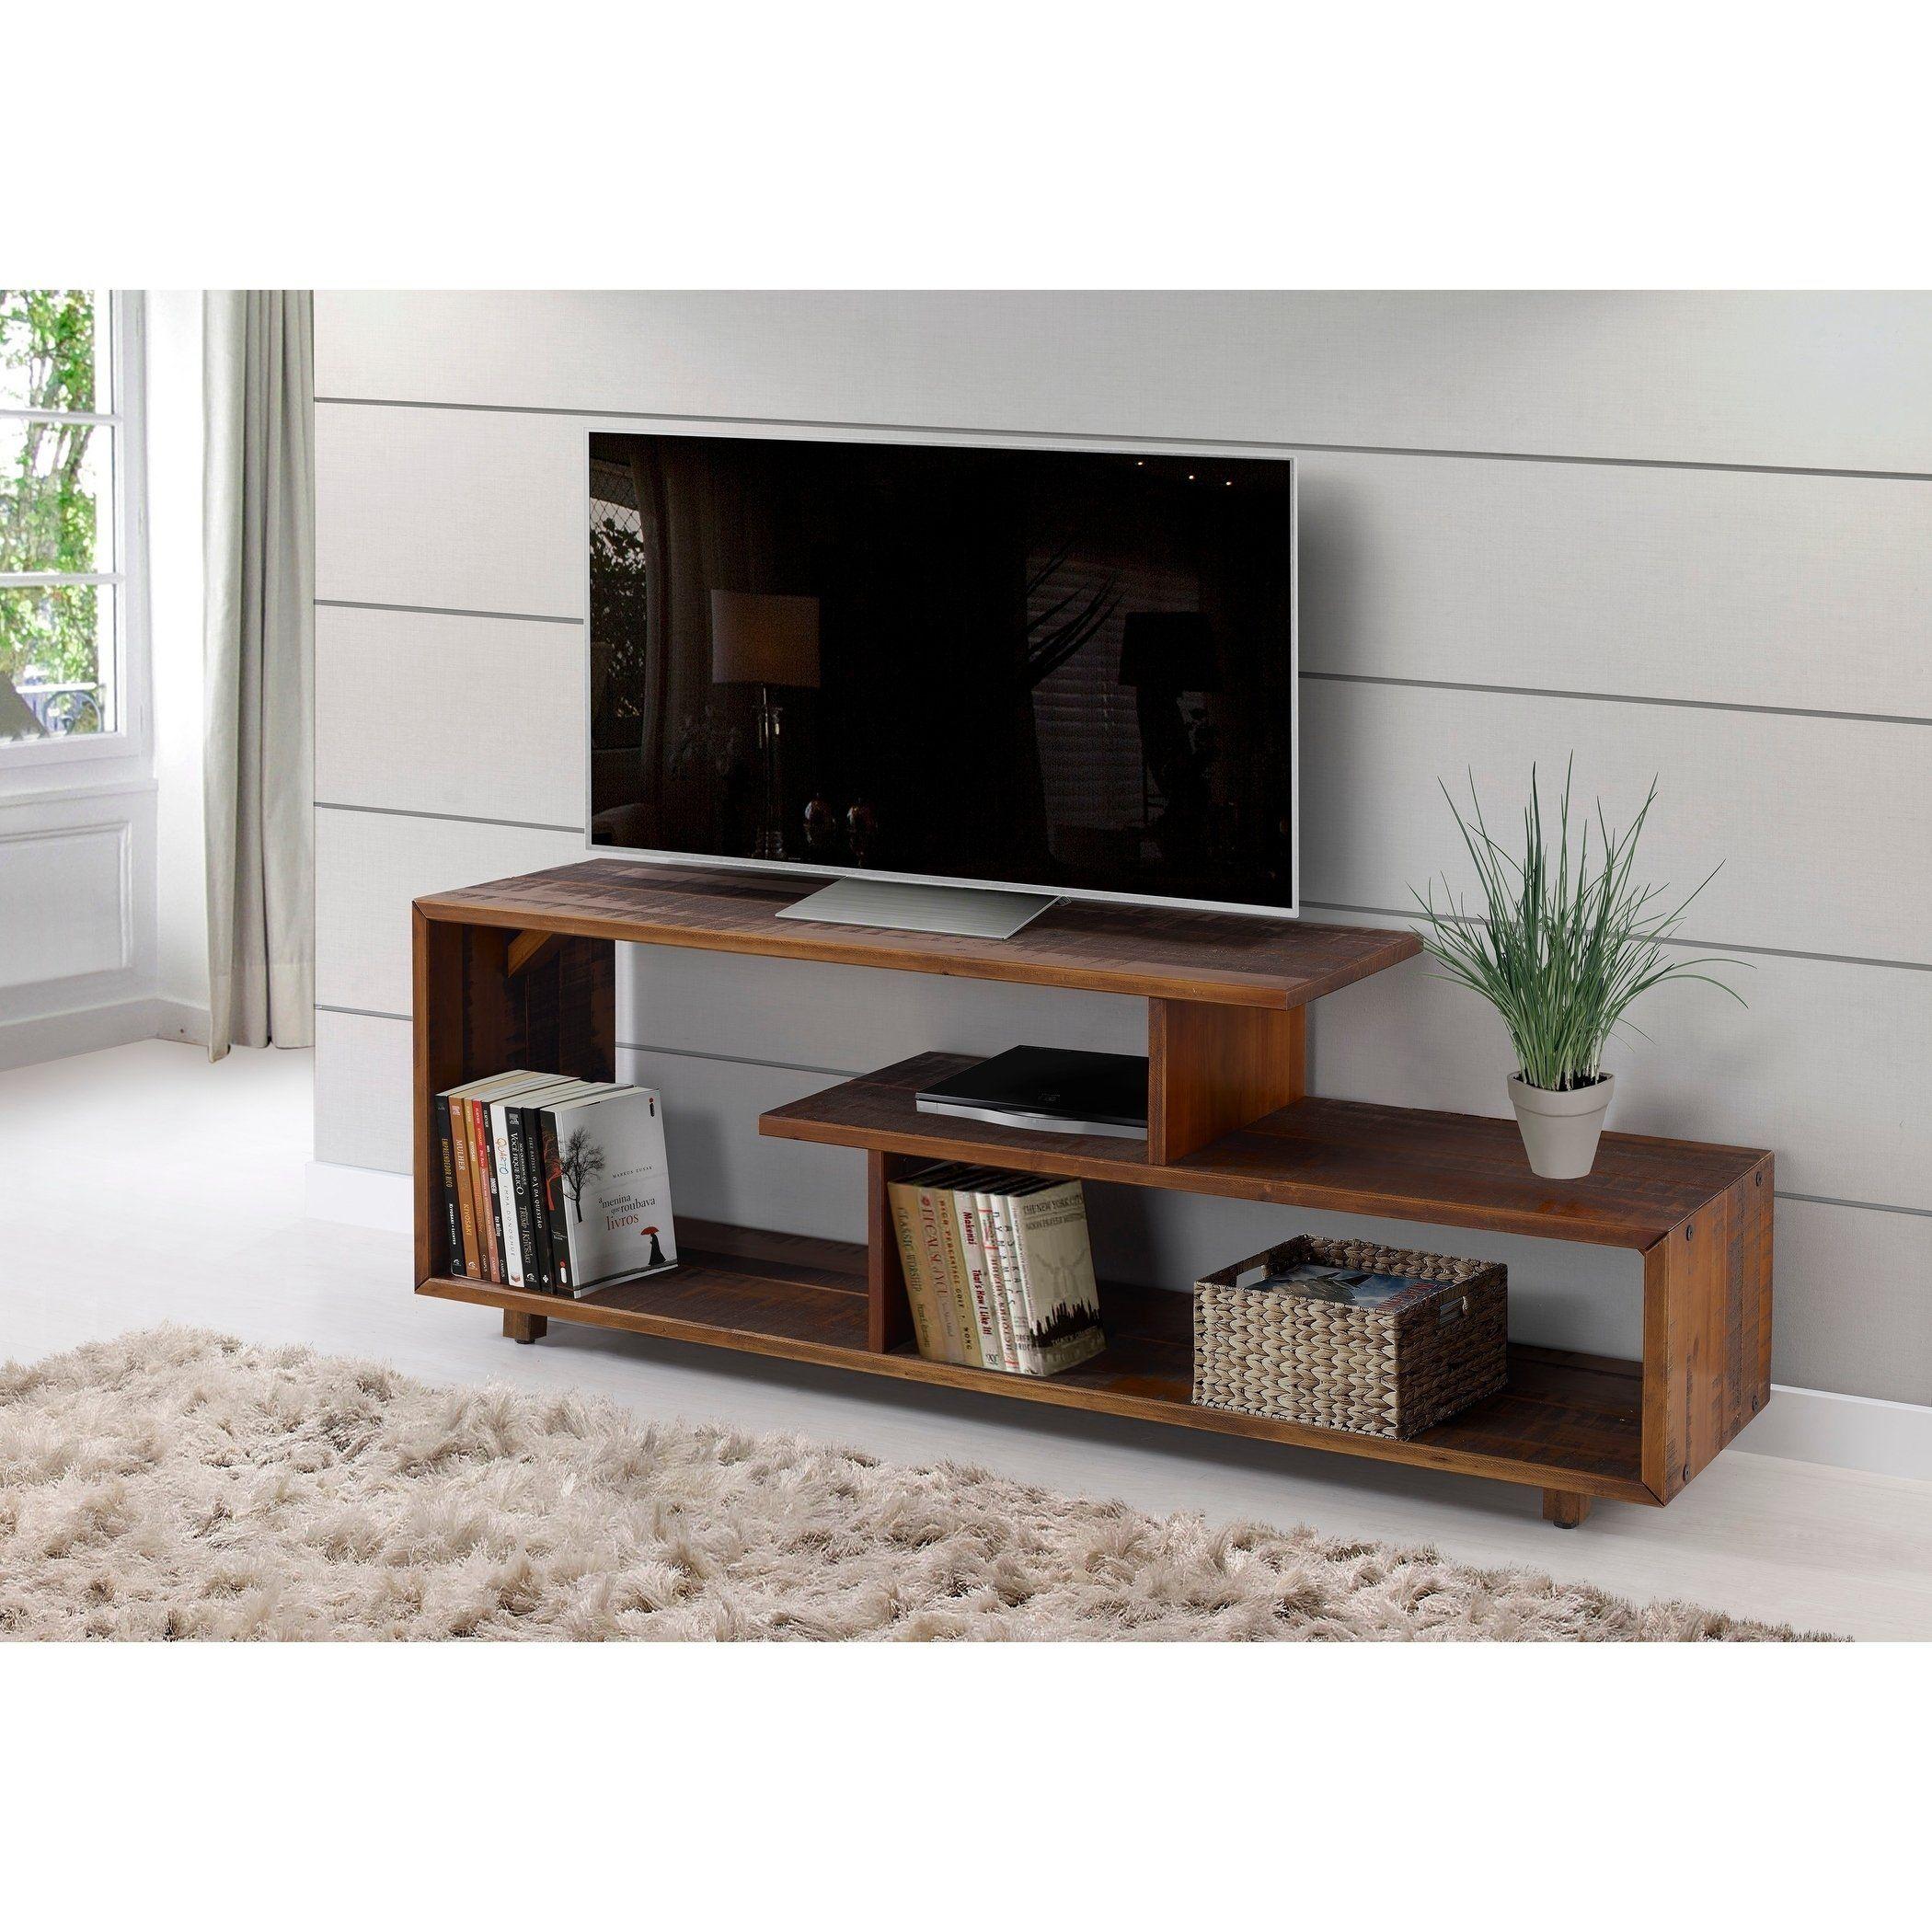 Overstock Com Online Shopping Bedding Furniture Electronics Jewelry Clothing More Wohnzimmer Modern Wohnzimmermobel Modern Haus Deko